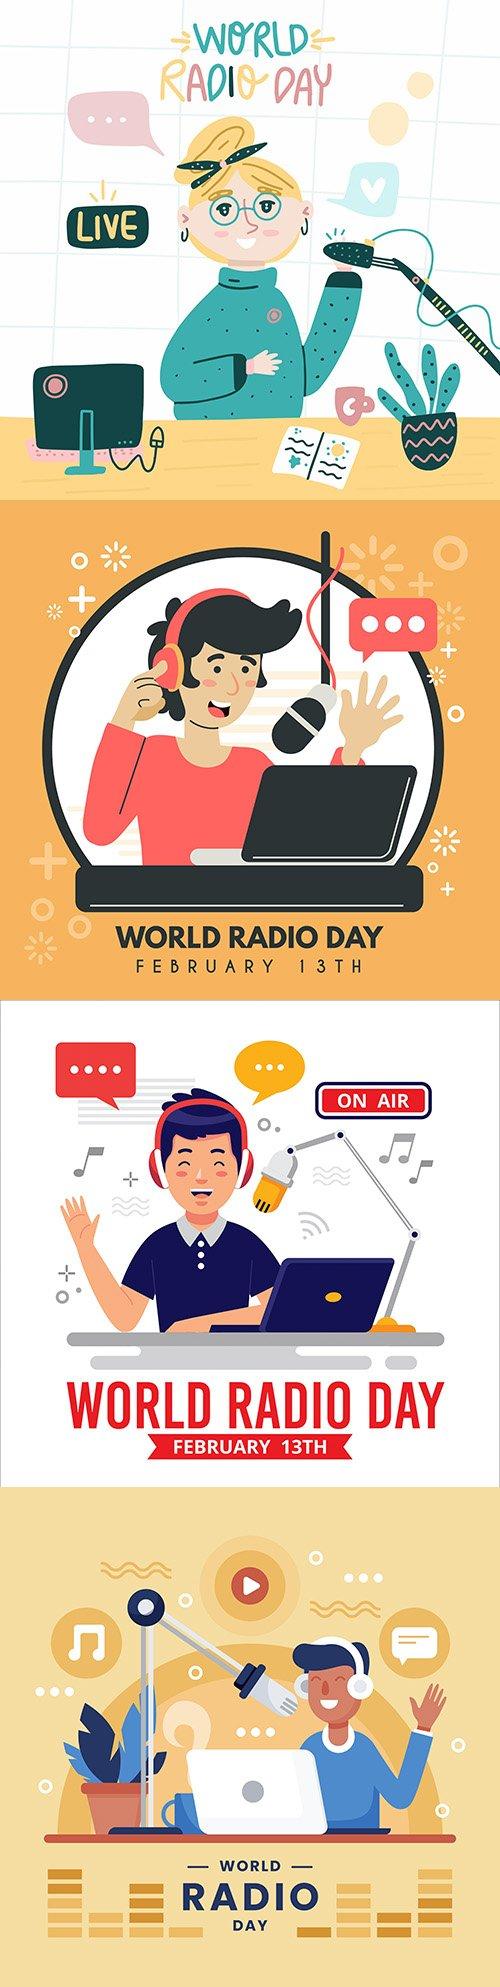 World Radio day background flat design illustration 2